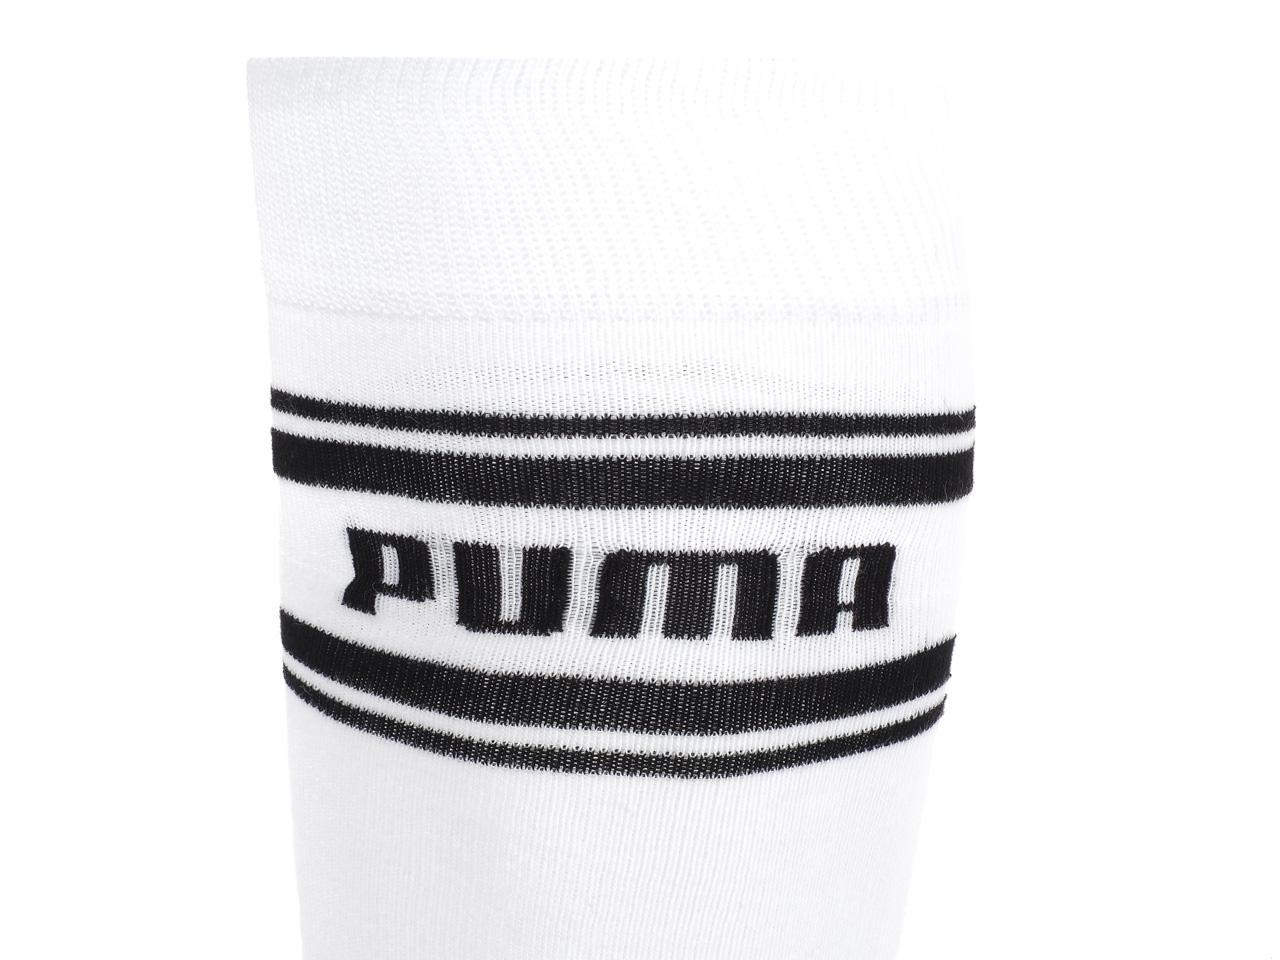 Chaussettes-Puma-Seasonnal-kneehigh-blanc-Blanc-46332-Neuf